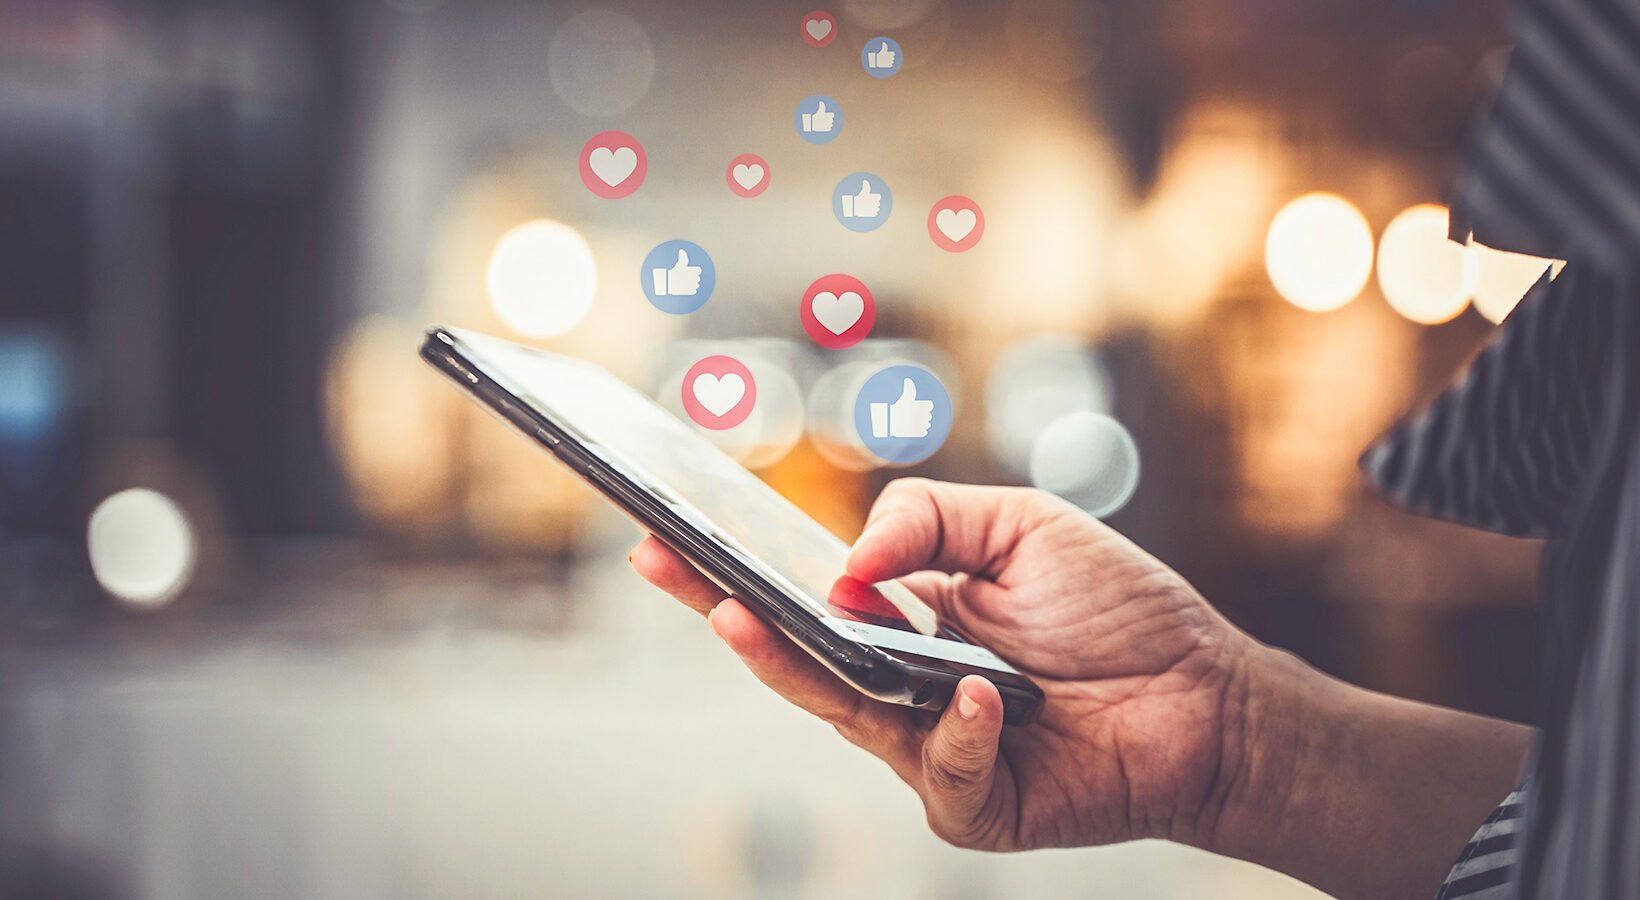 Unternehmen - Social Media - 01